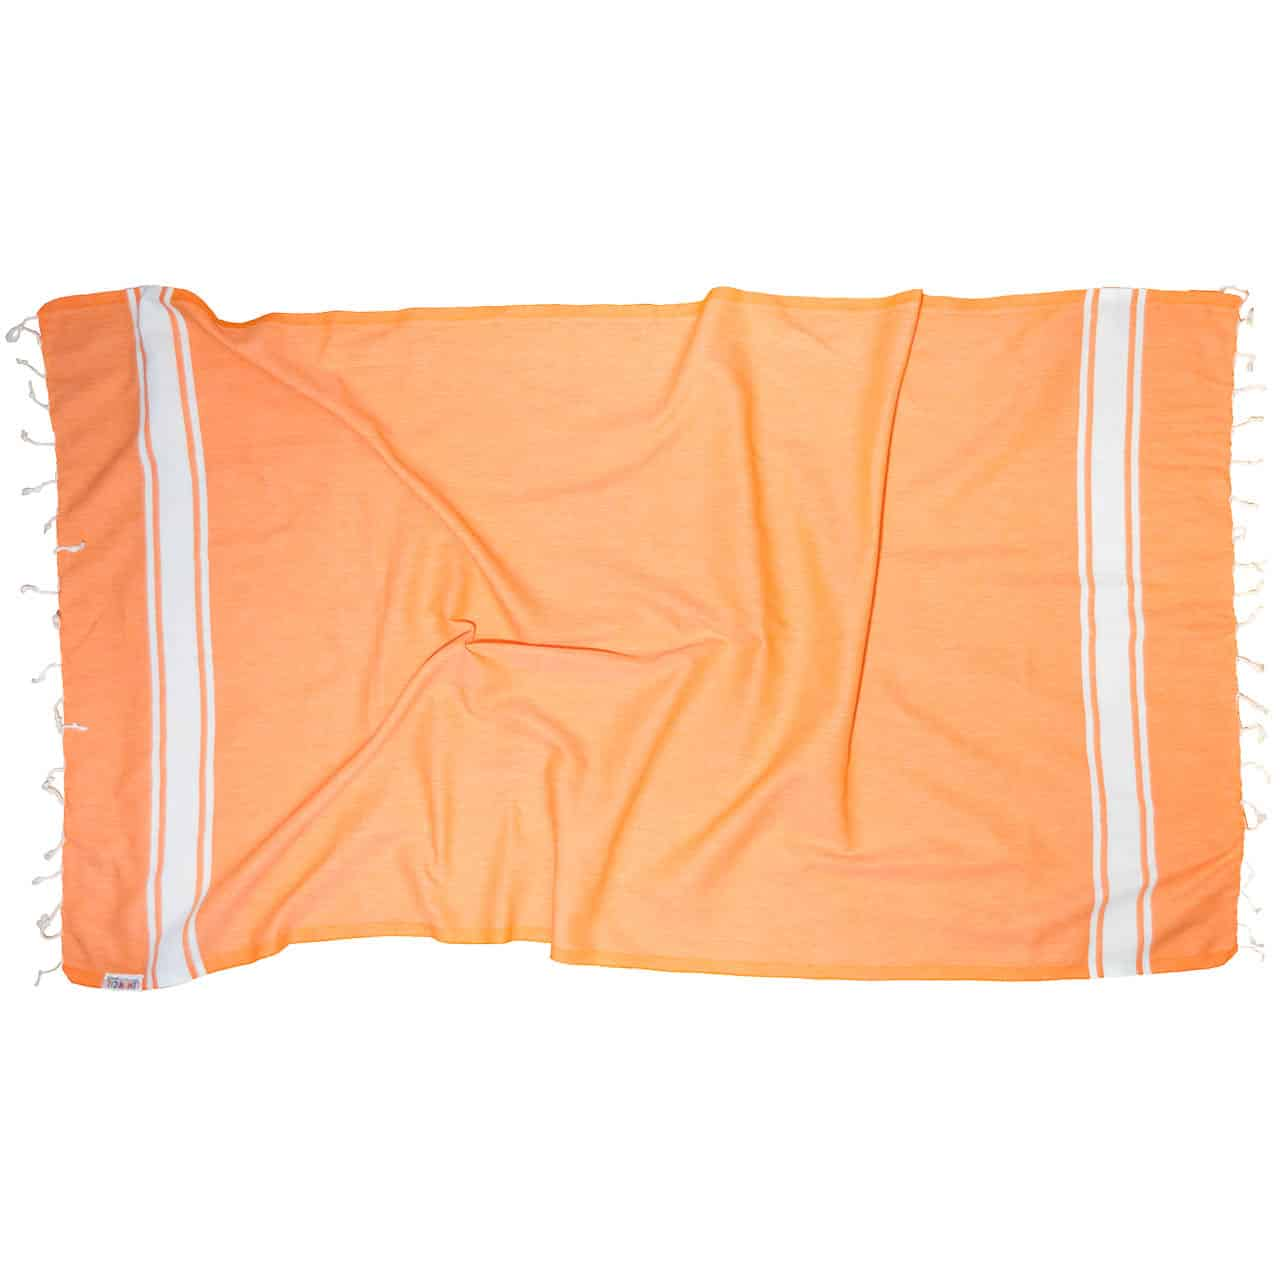 TANGERINE Towel